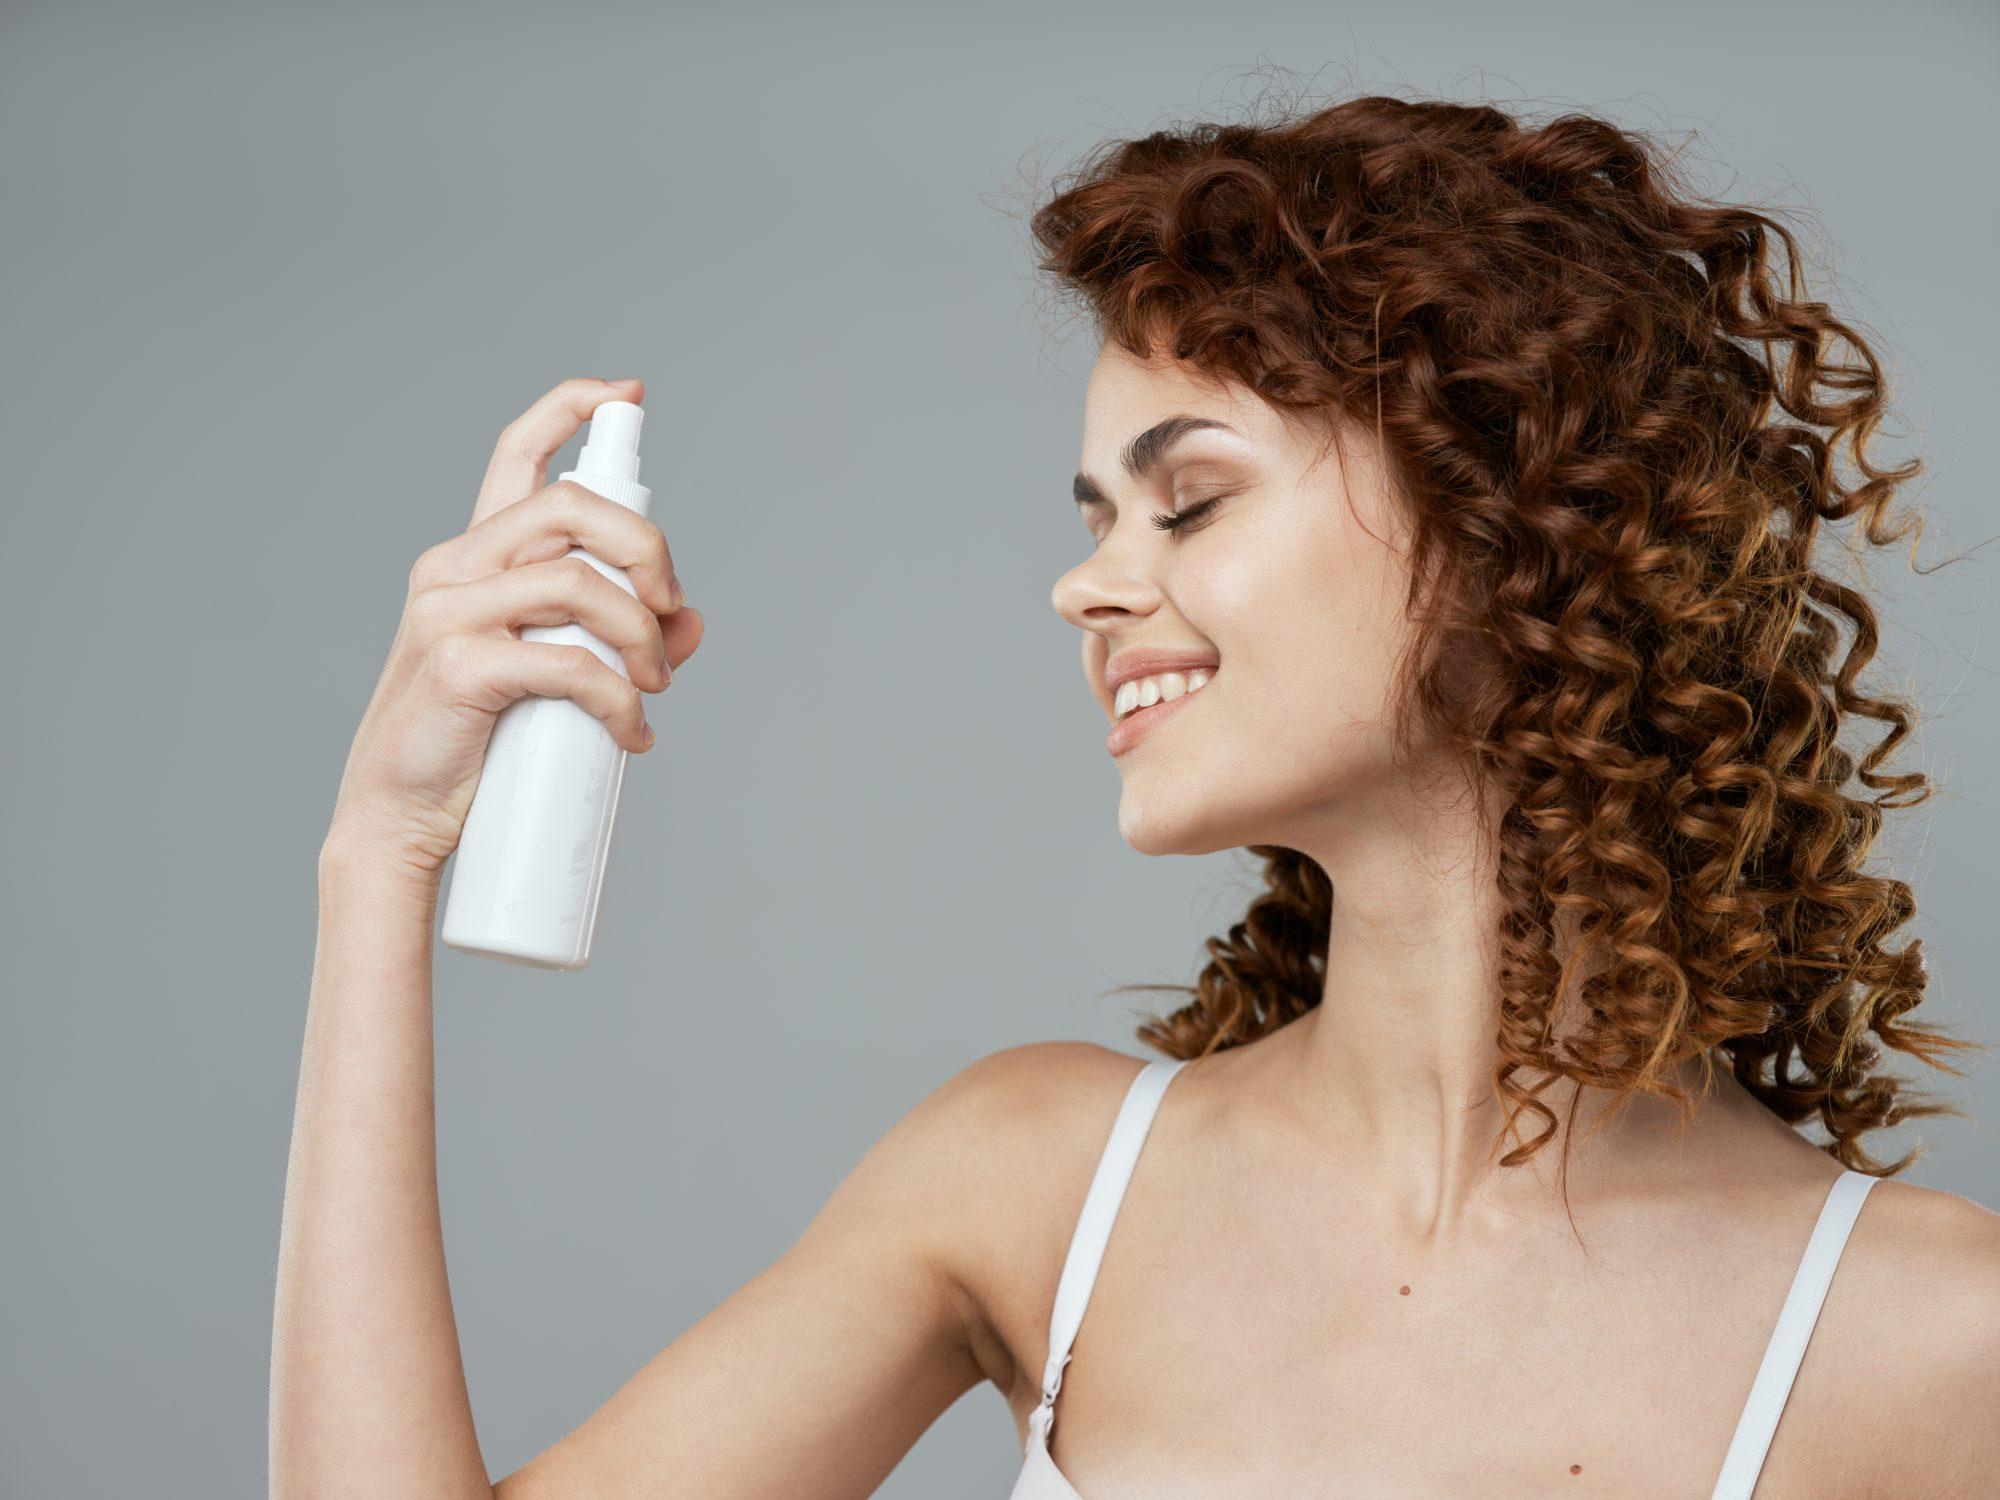 Mejor bruma facial, piel reseca